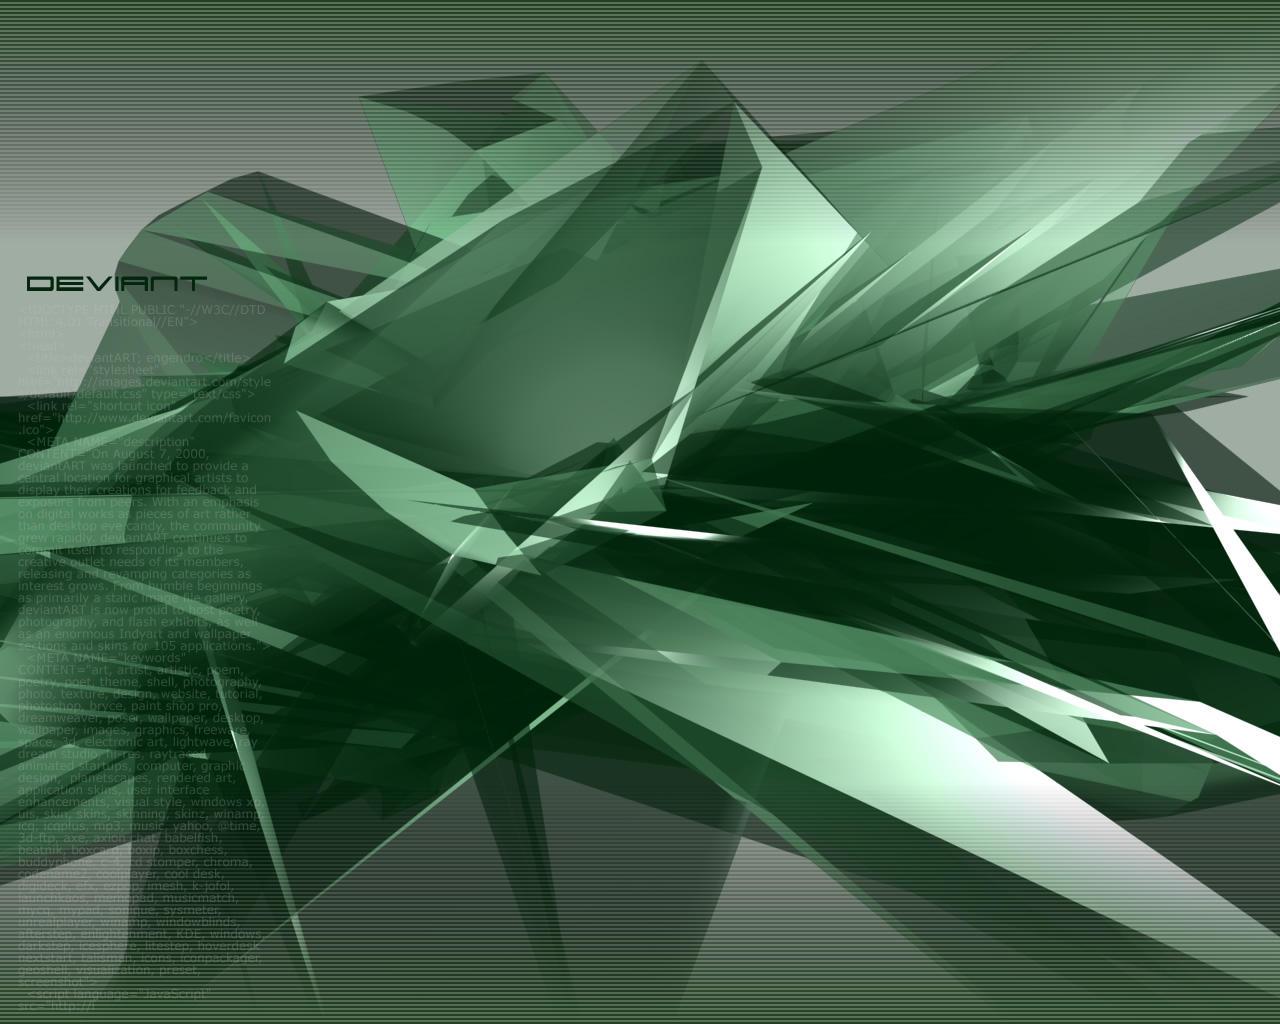 Gambar Abstrak http://engendro.deviantart.com/art/Abstrak-Green-320590